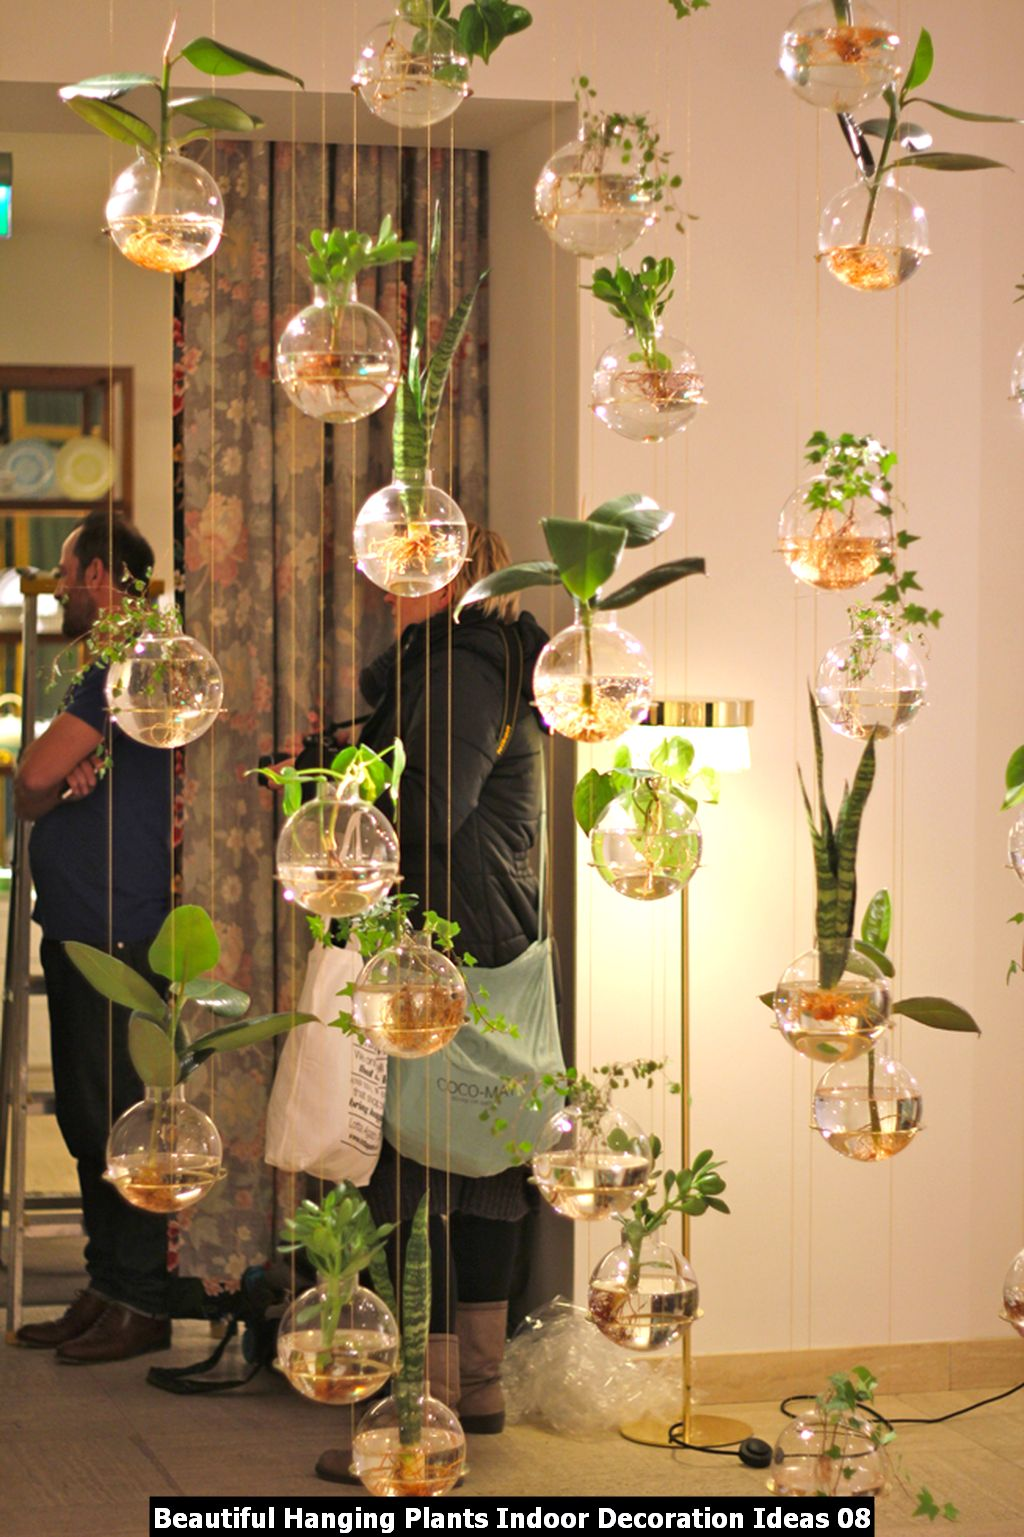 Beautiful Hanging Plants Indoor Decoration Ideas 08